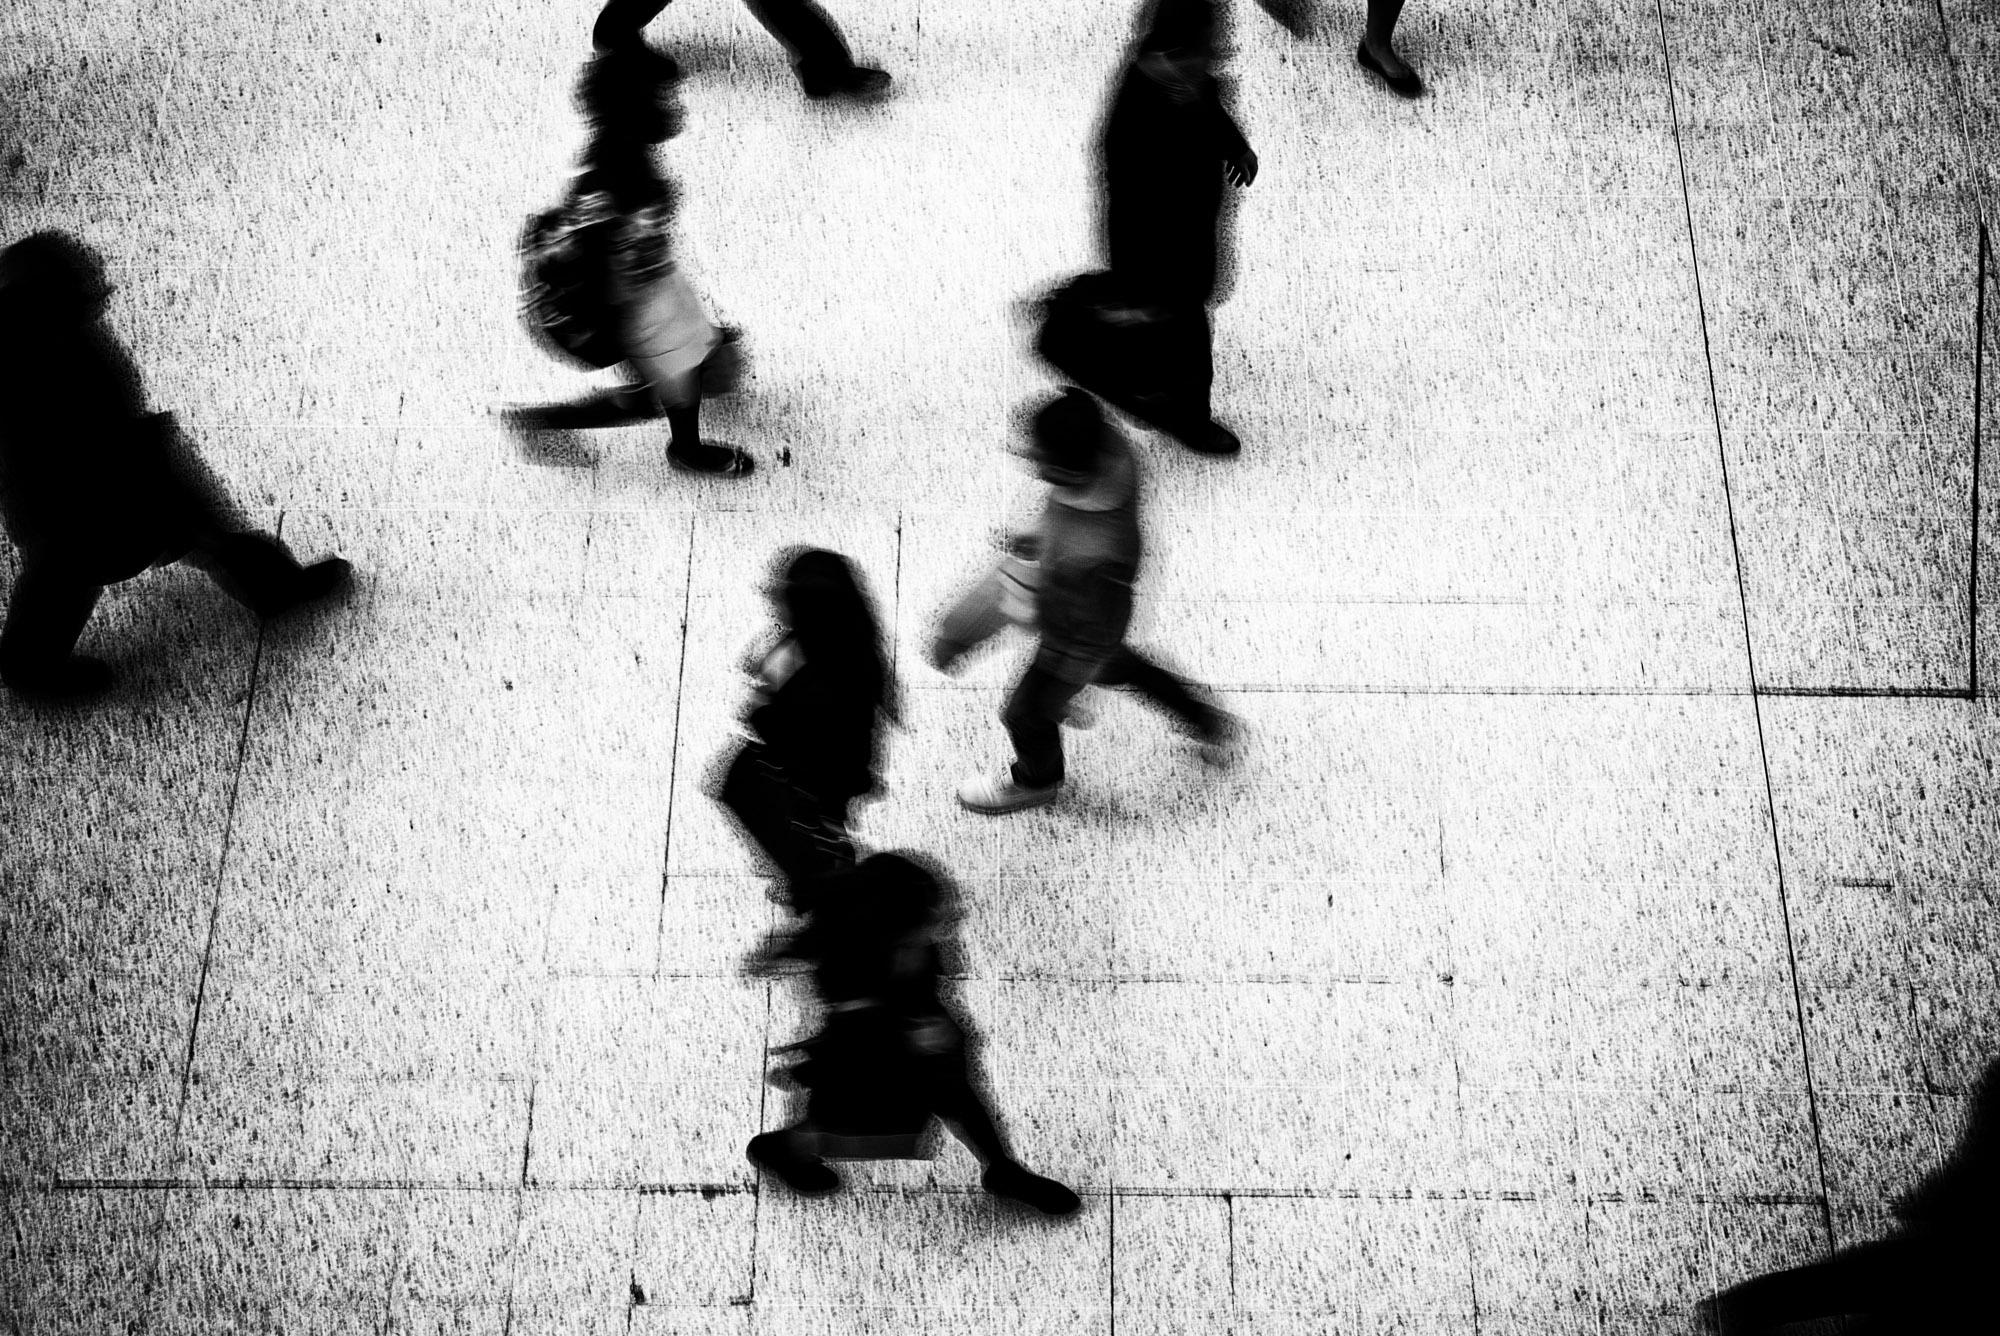 Grainy image of people walking